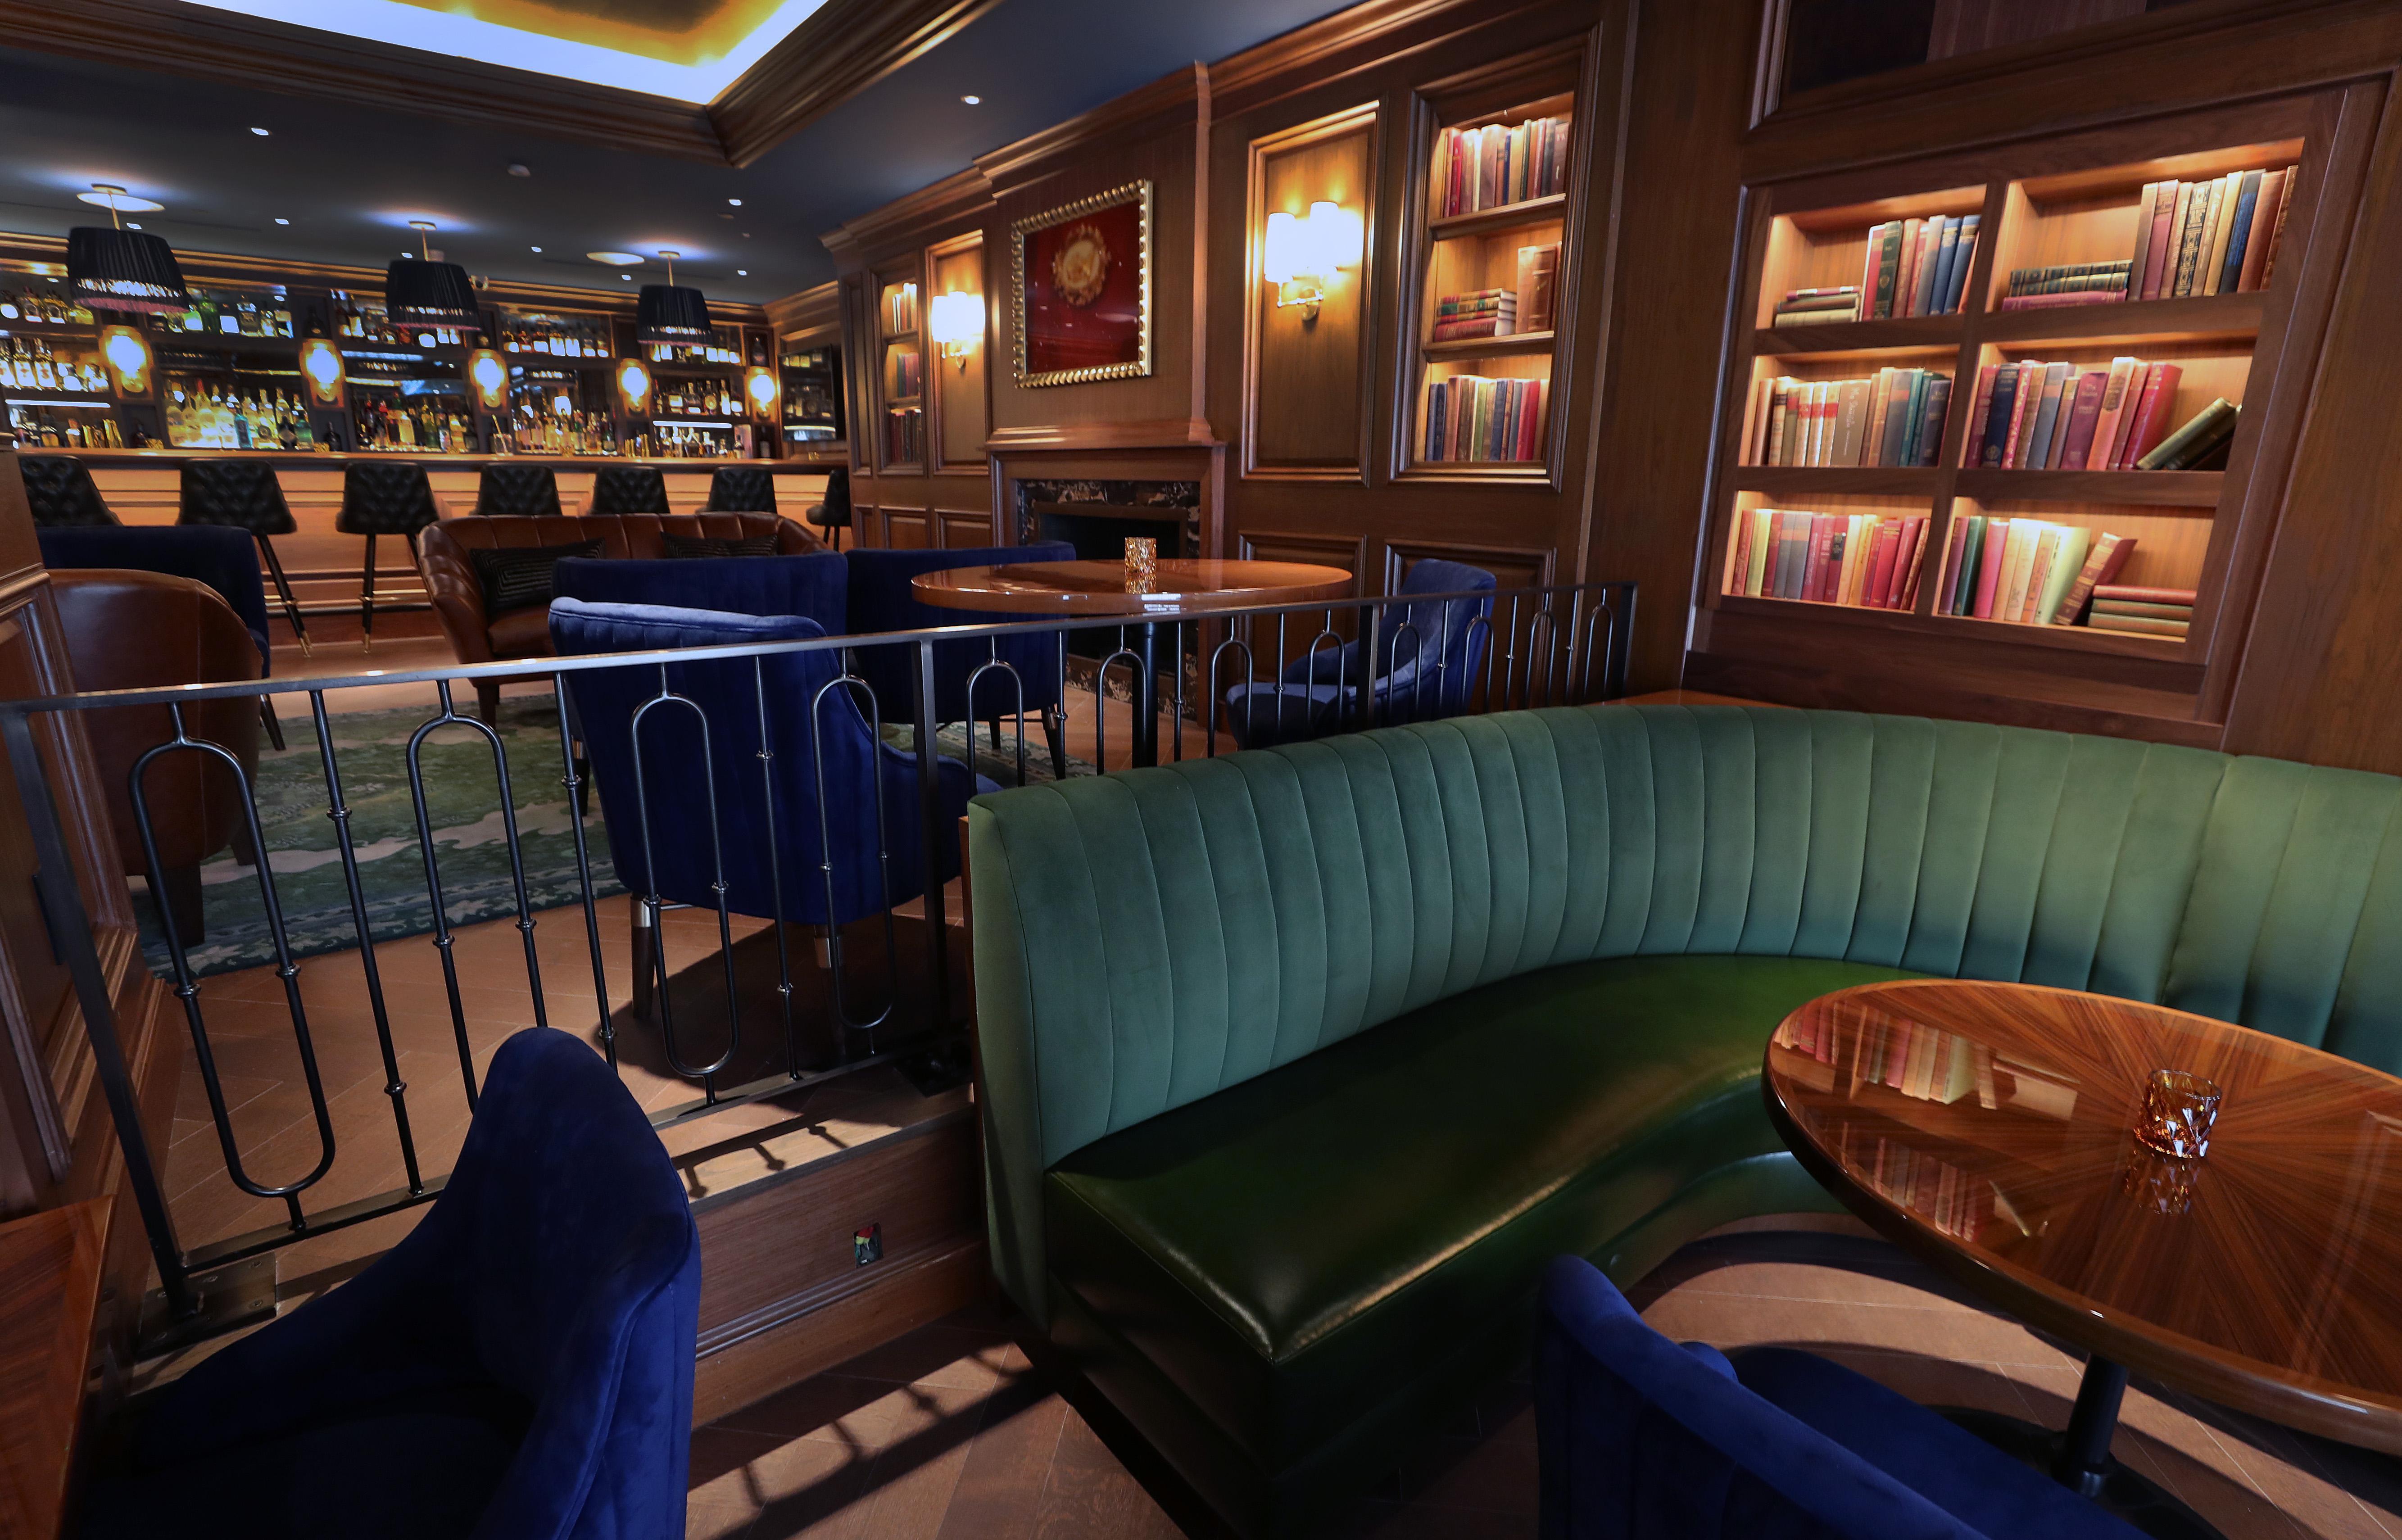 The bar at The Newbury Boston.